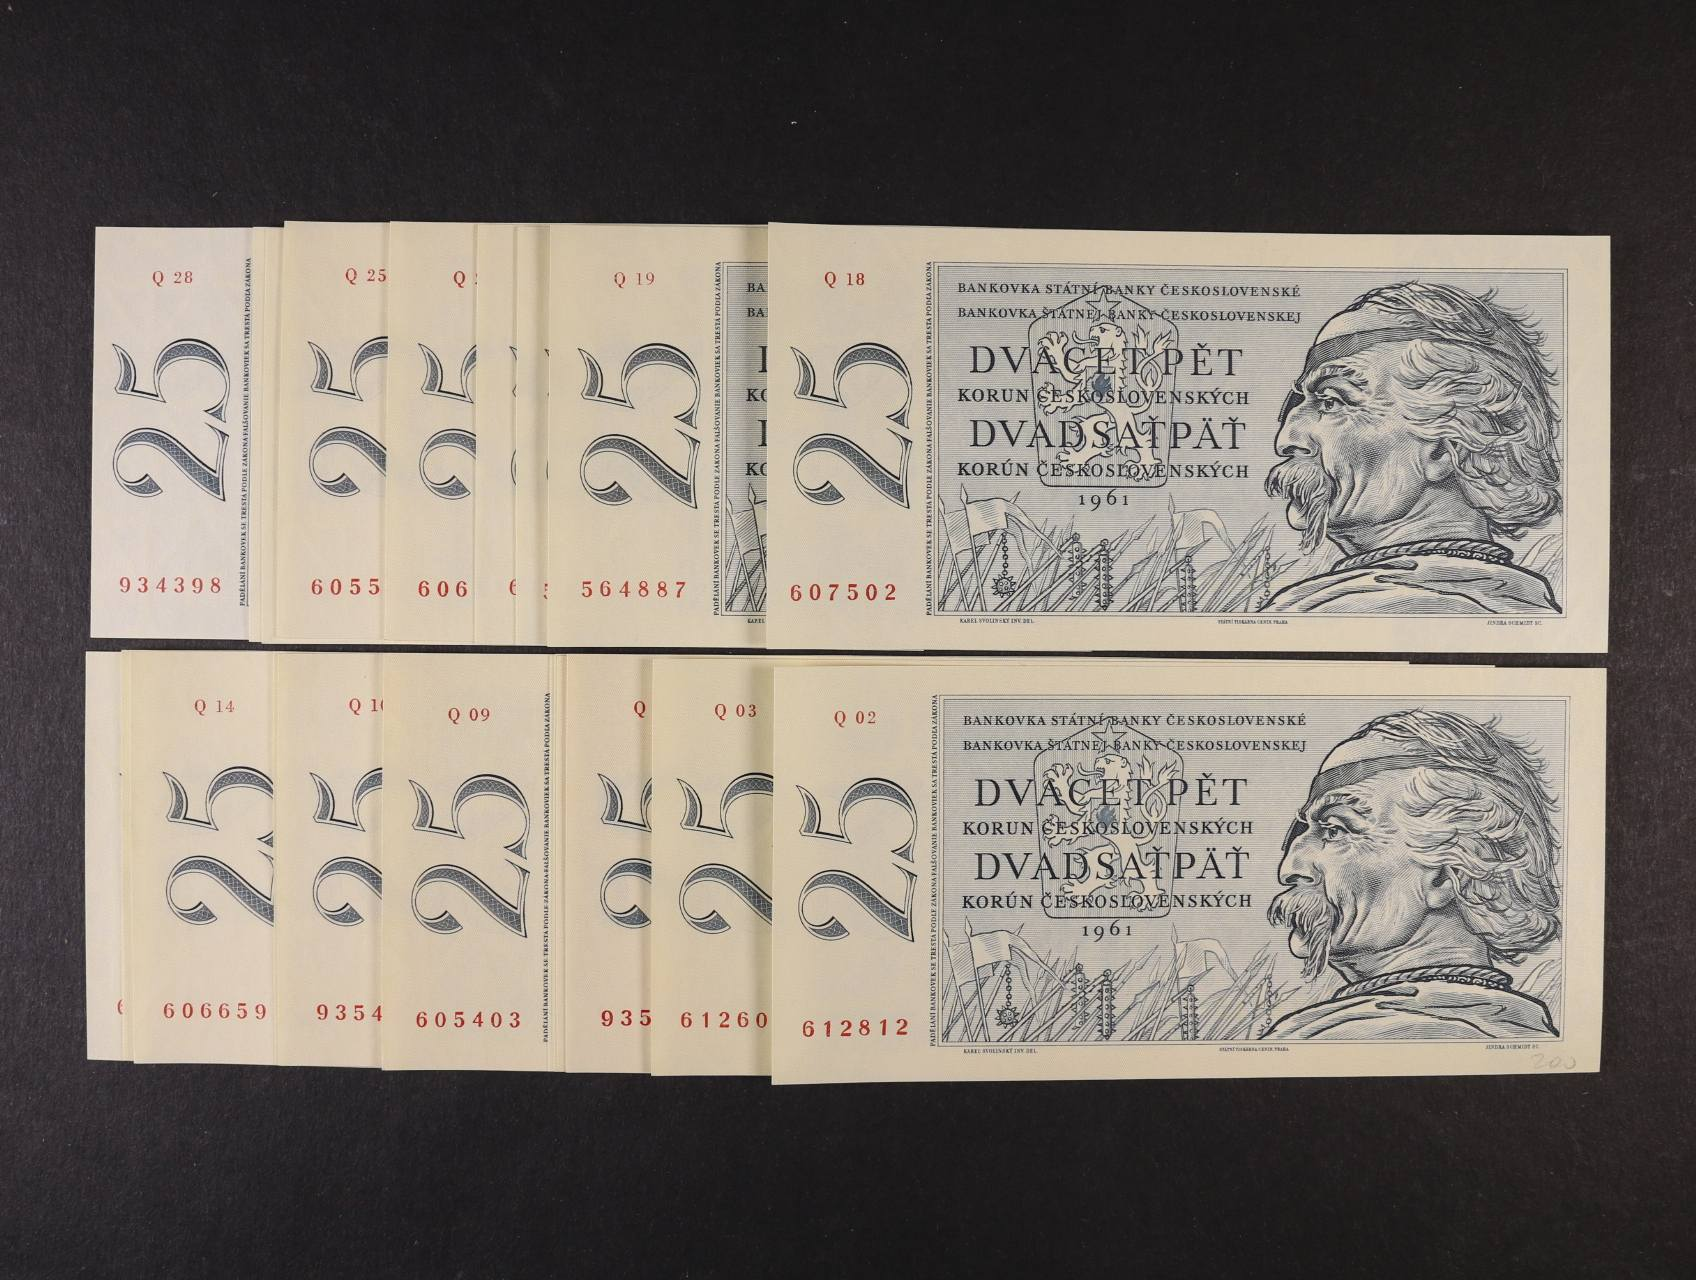 25 Kčs 1961 série Q 02, 03, 04, 05, 06, 07, 08, 09, 10, 13, 14, 15, 16, 18, 19, 20, 21, 22, 25, 26, 27, 28, Ba . 97b, Pi. 89a, 22ks